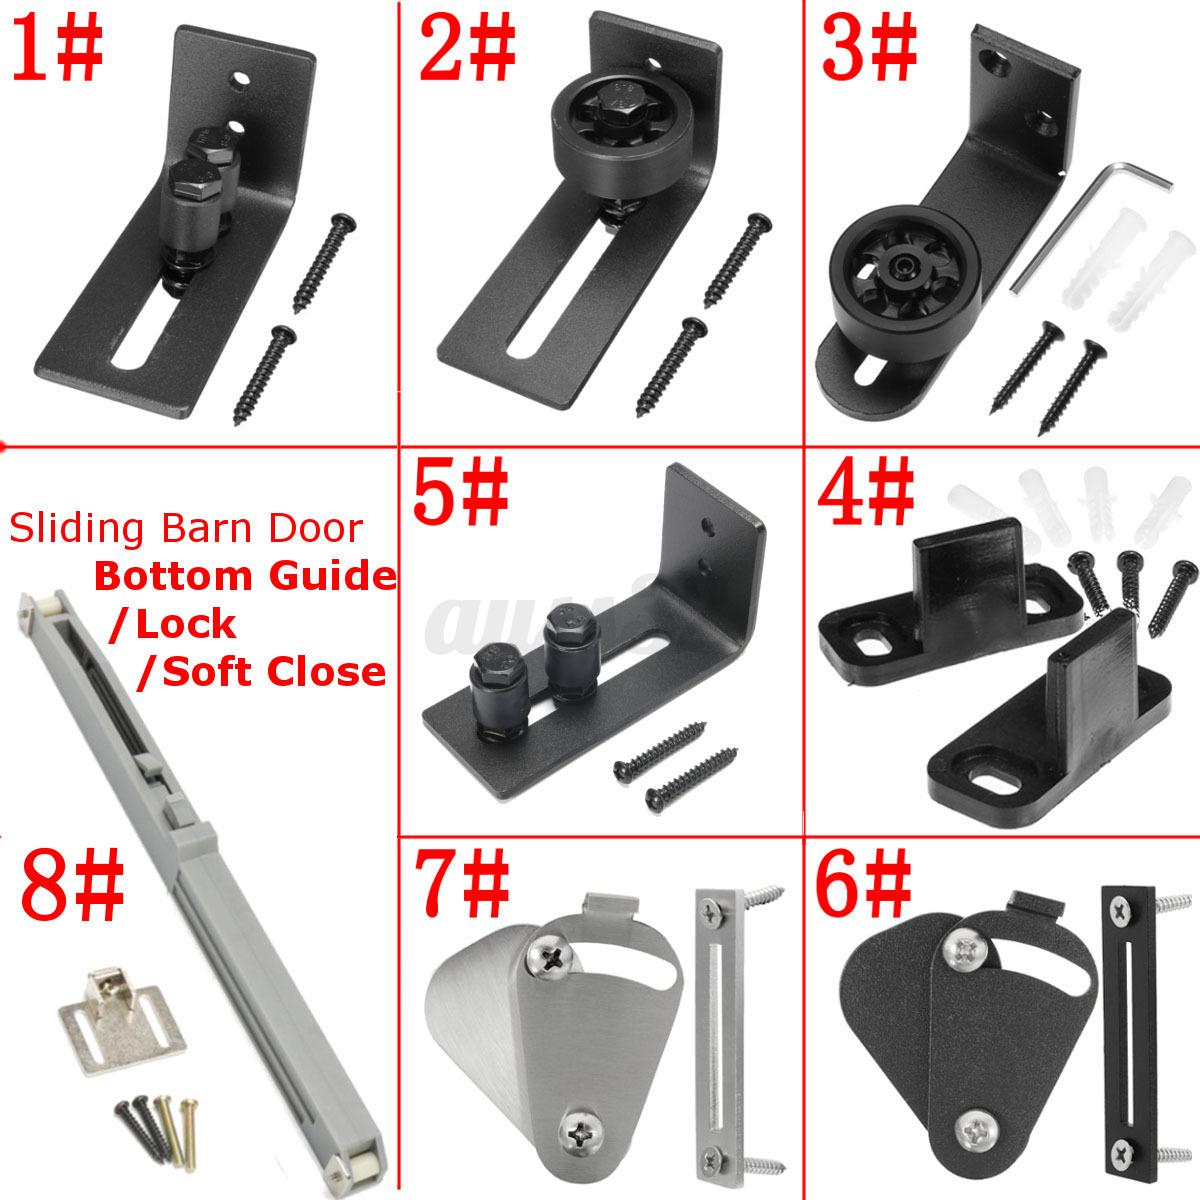 8 Types Wall Mount Floor Bottom Guide Sliding Barn Door